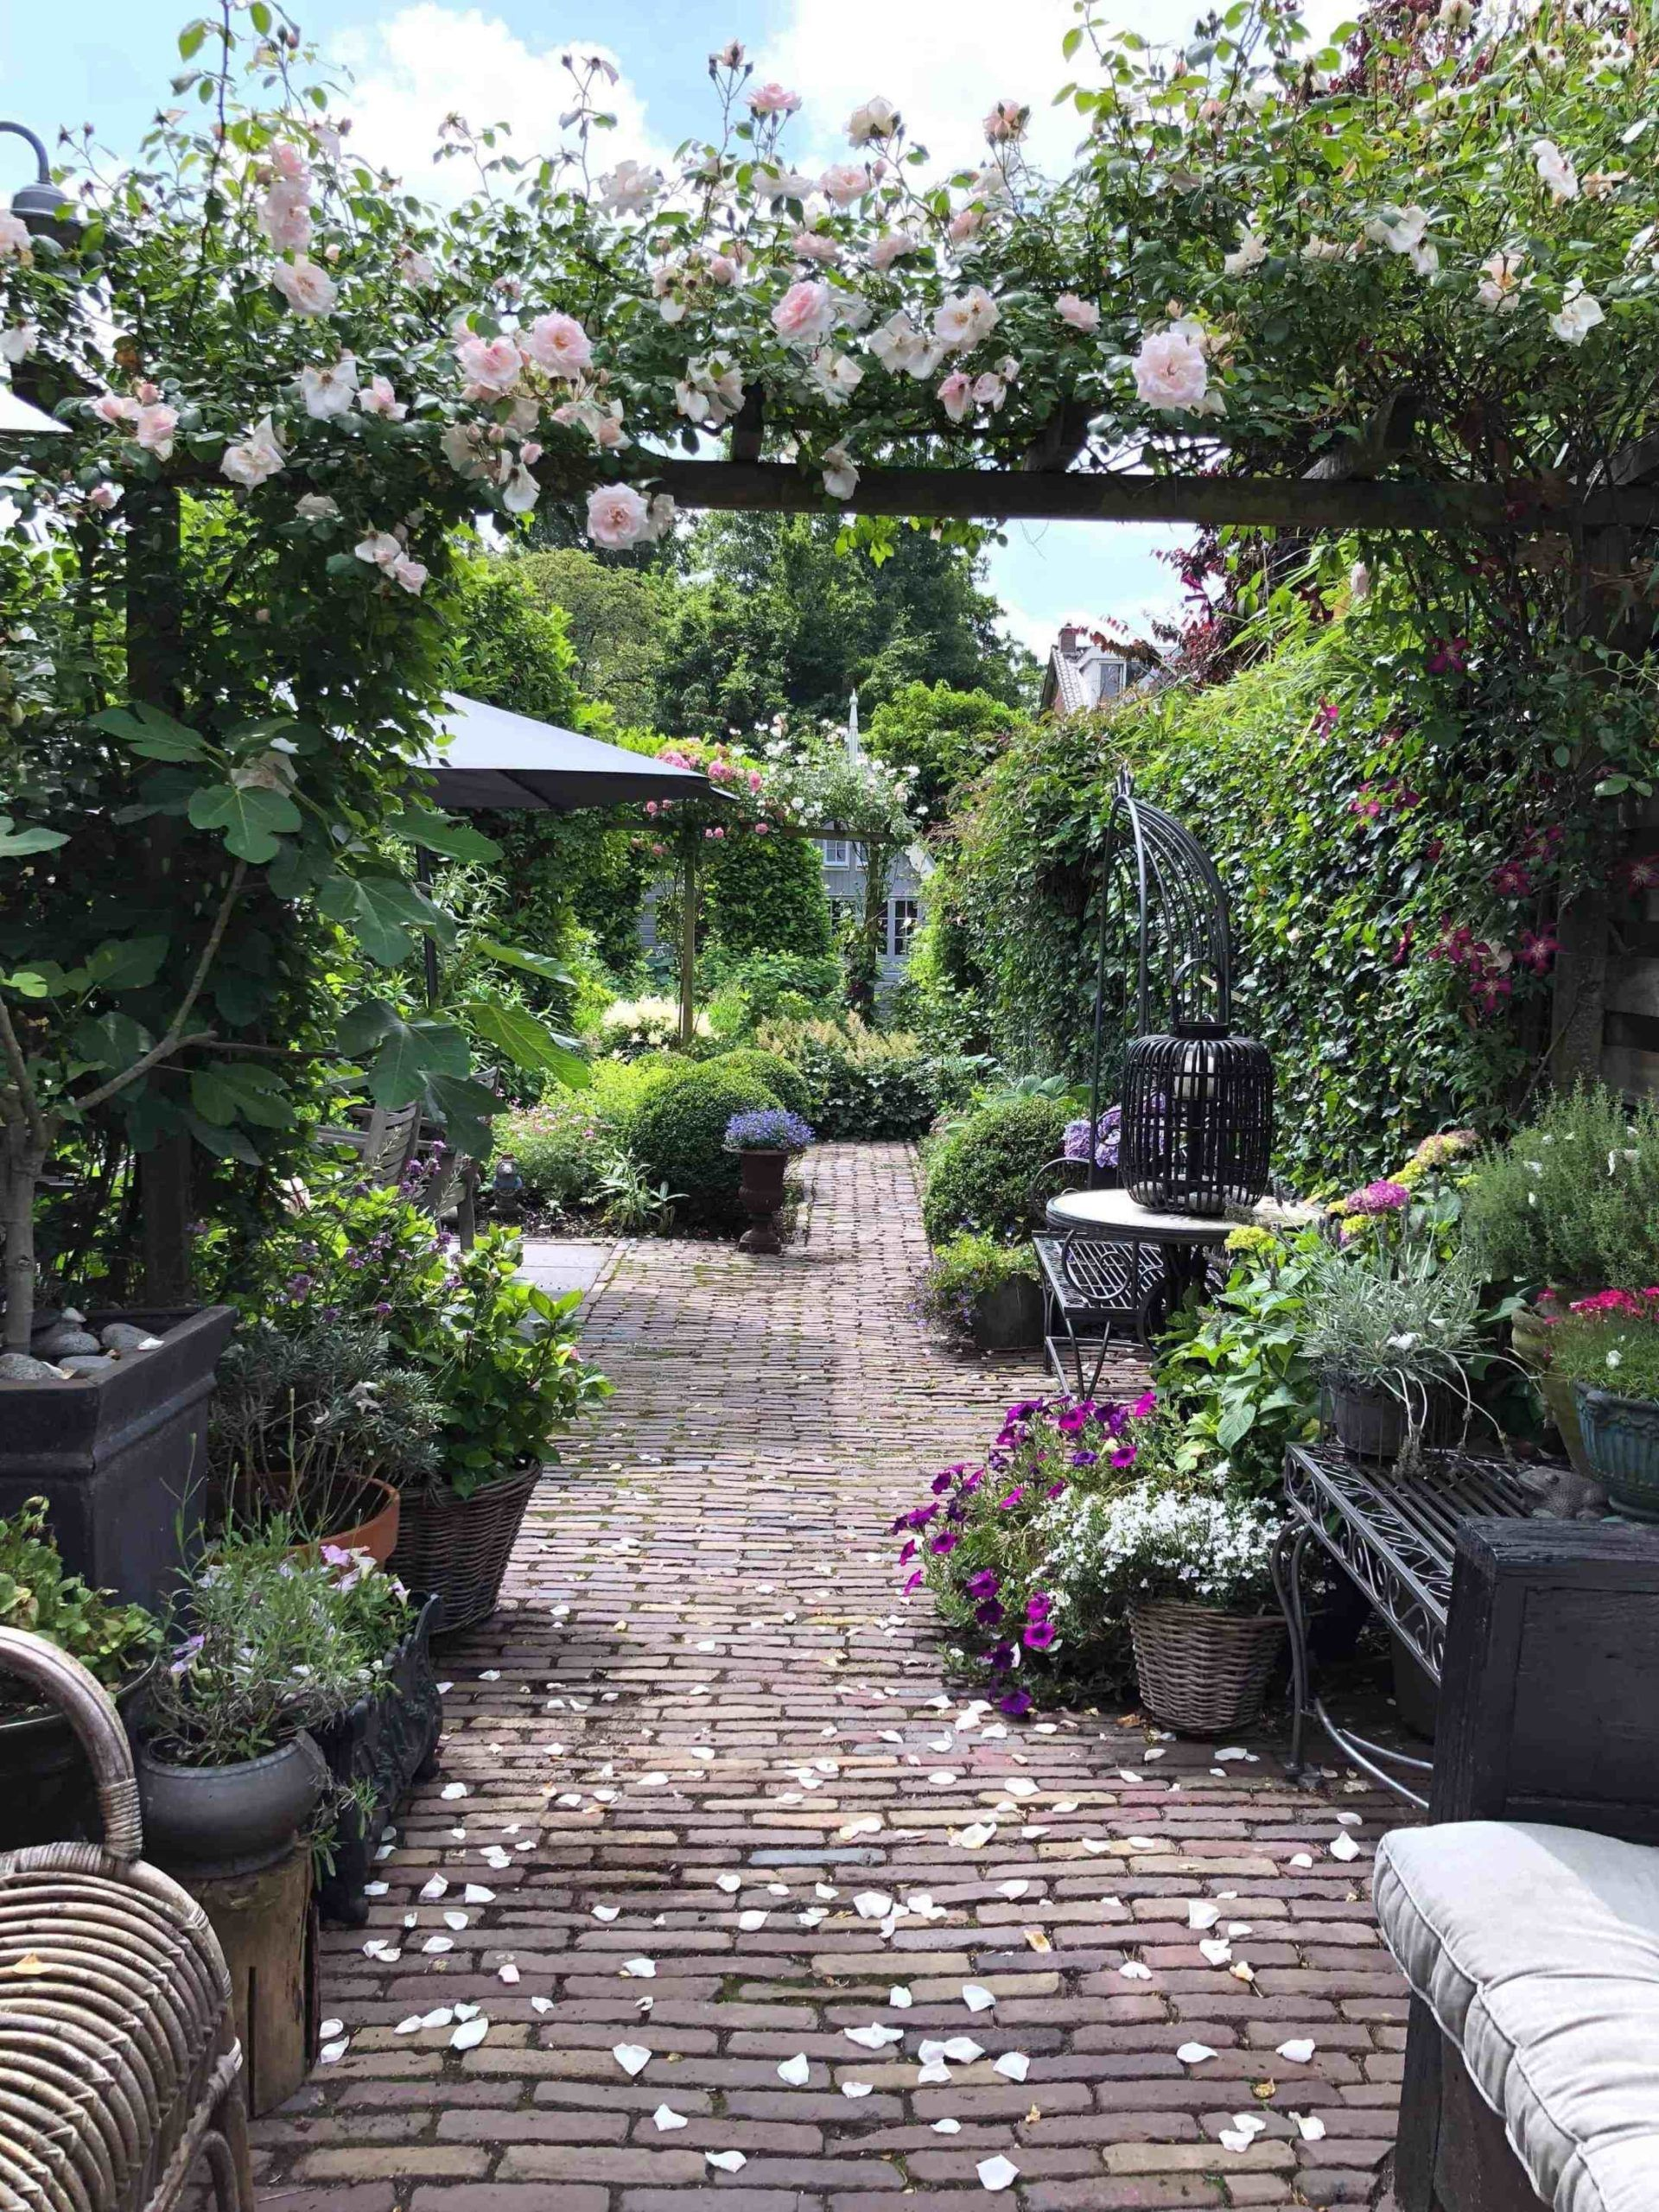 Instant kleur in de tuin (of op je balkon), zo doe je dat